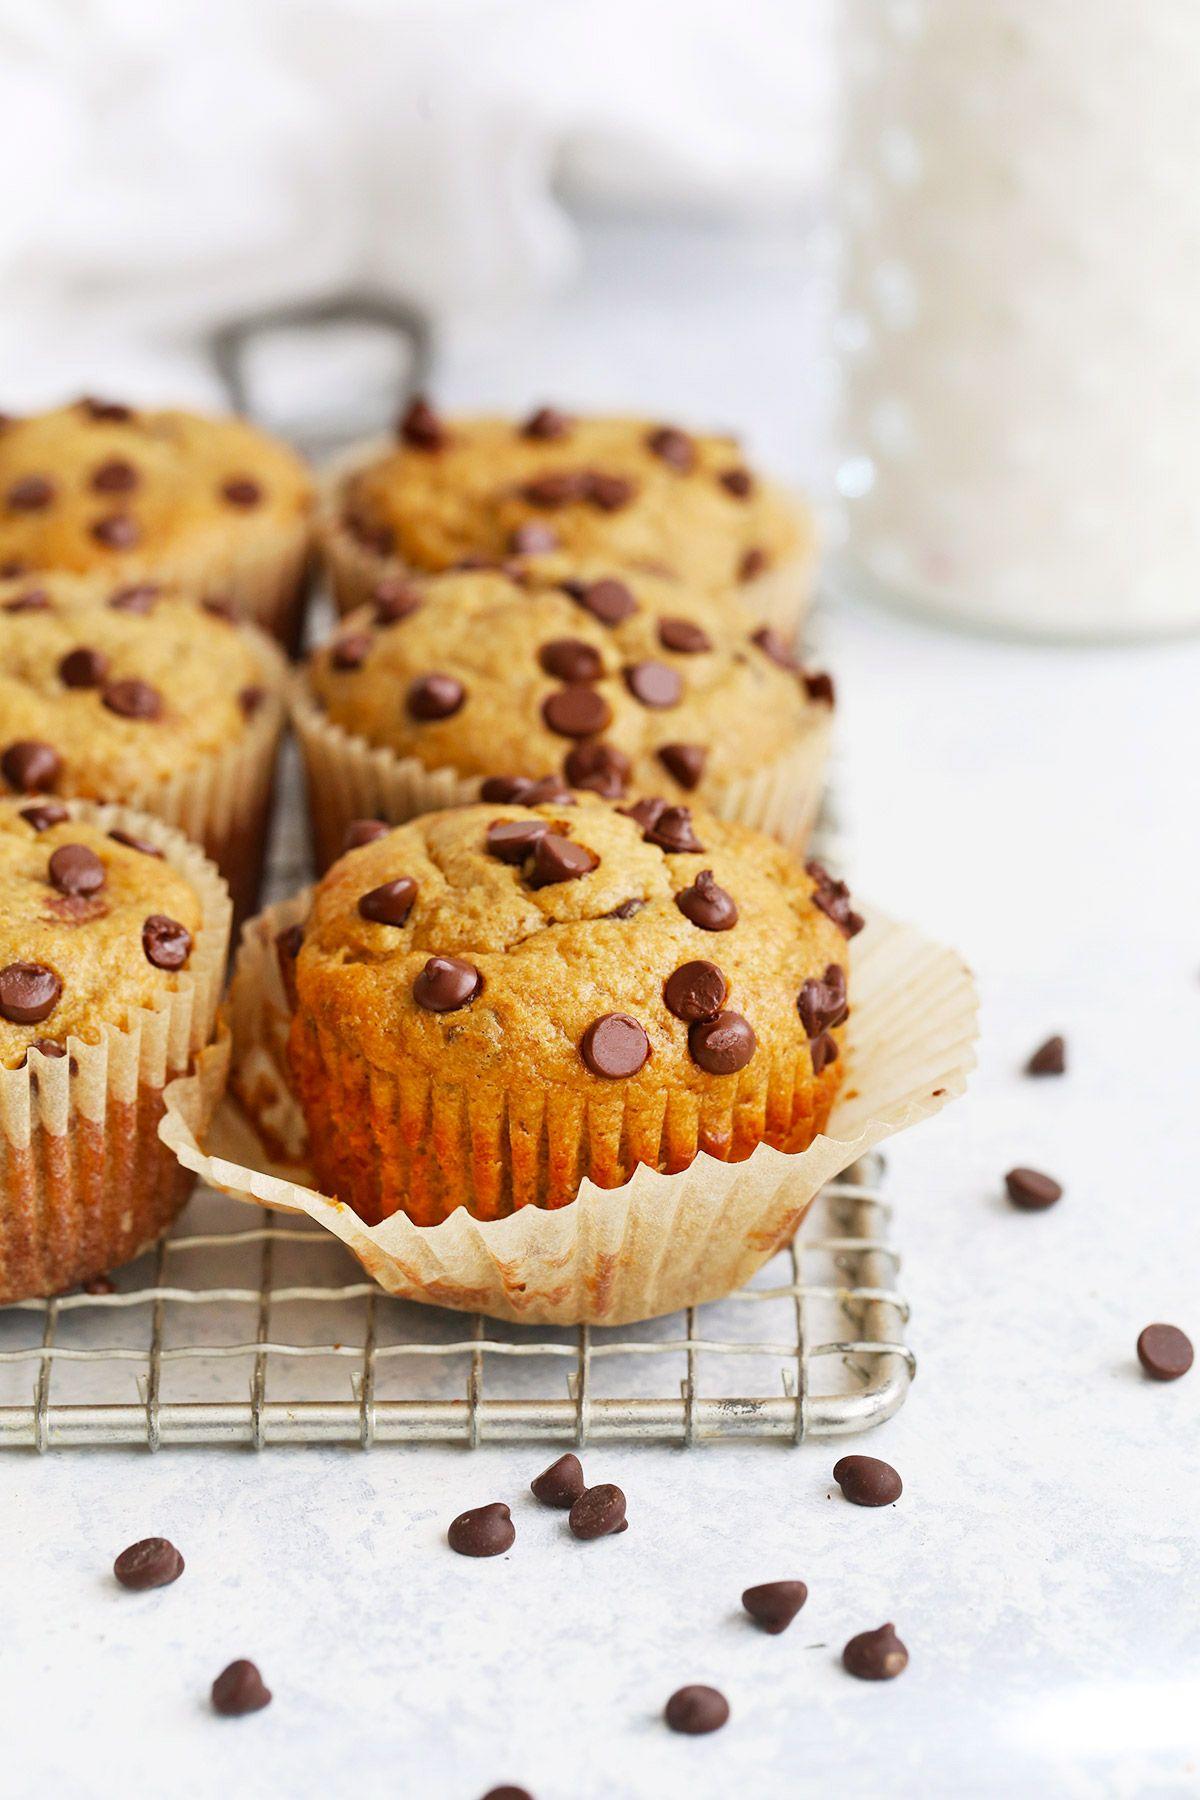 Healthy Peanut Butter Banana Muffins Gluten Free Recipe